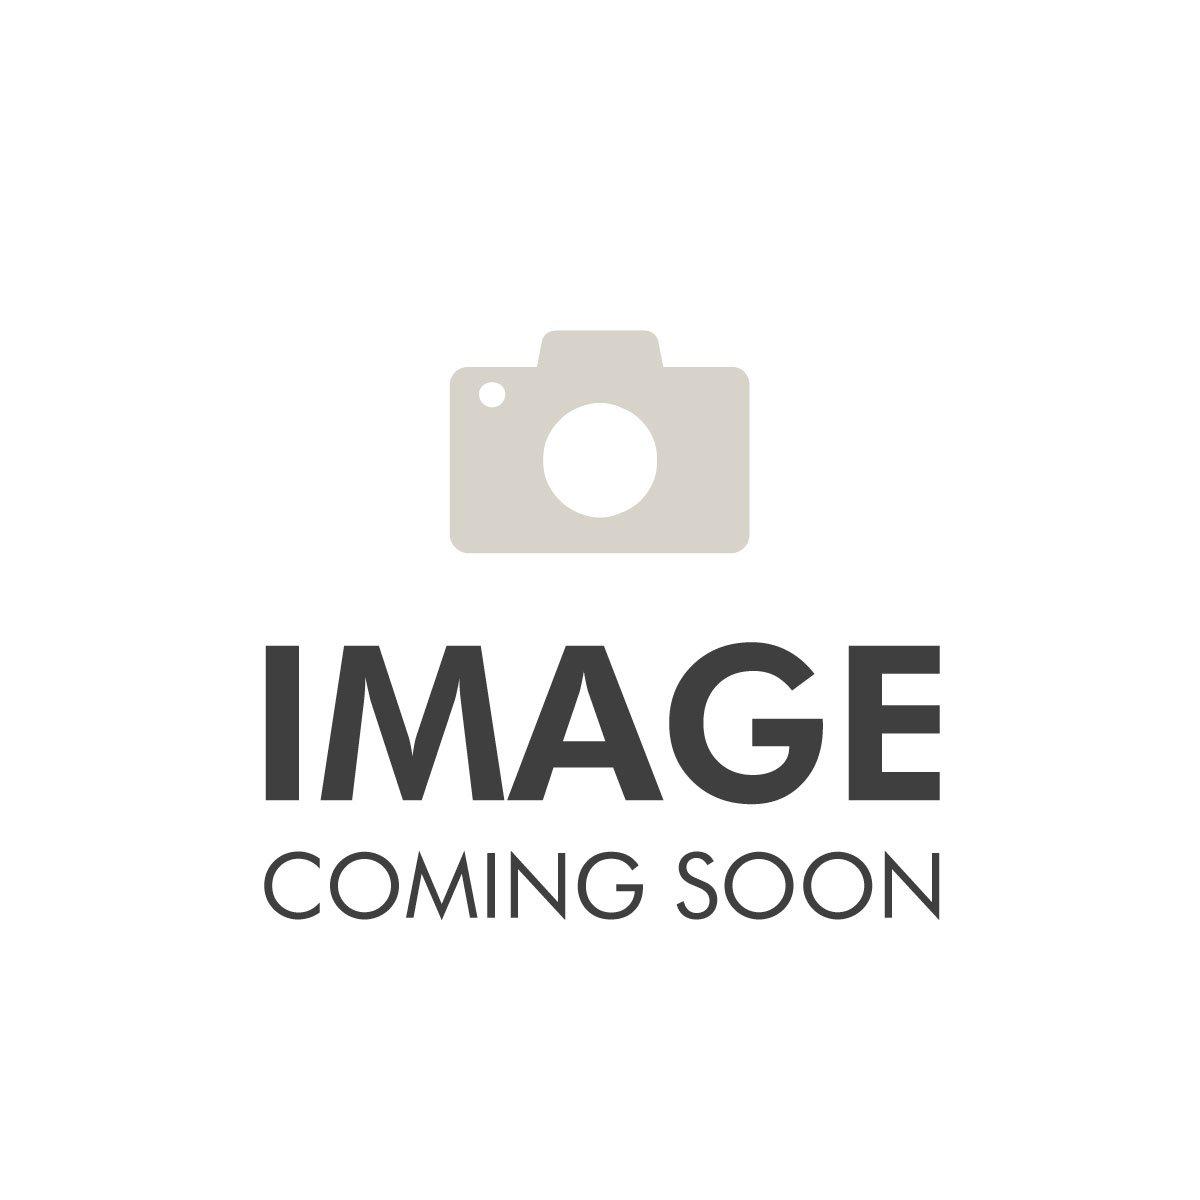 Bvlgari Bulgari Aqua Pour Homme Marine 200ml Shampoo & Shower Gel